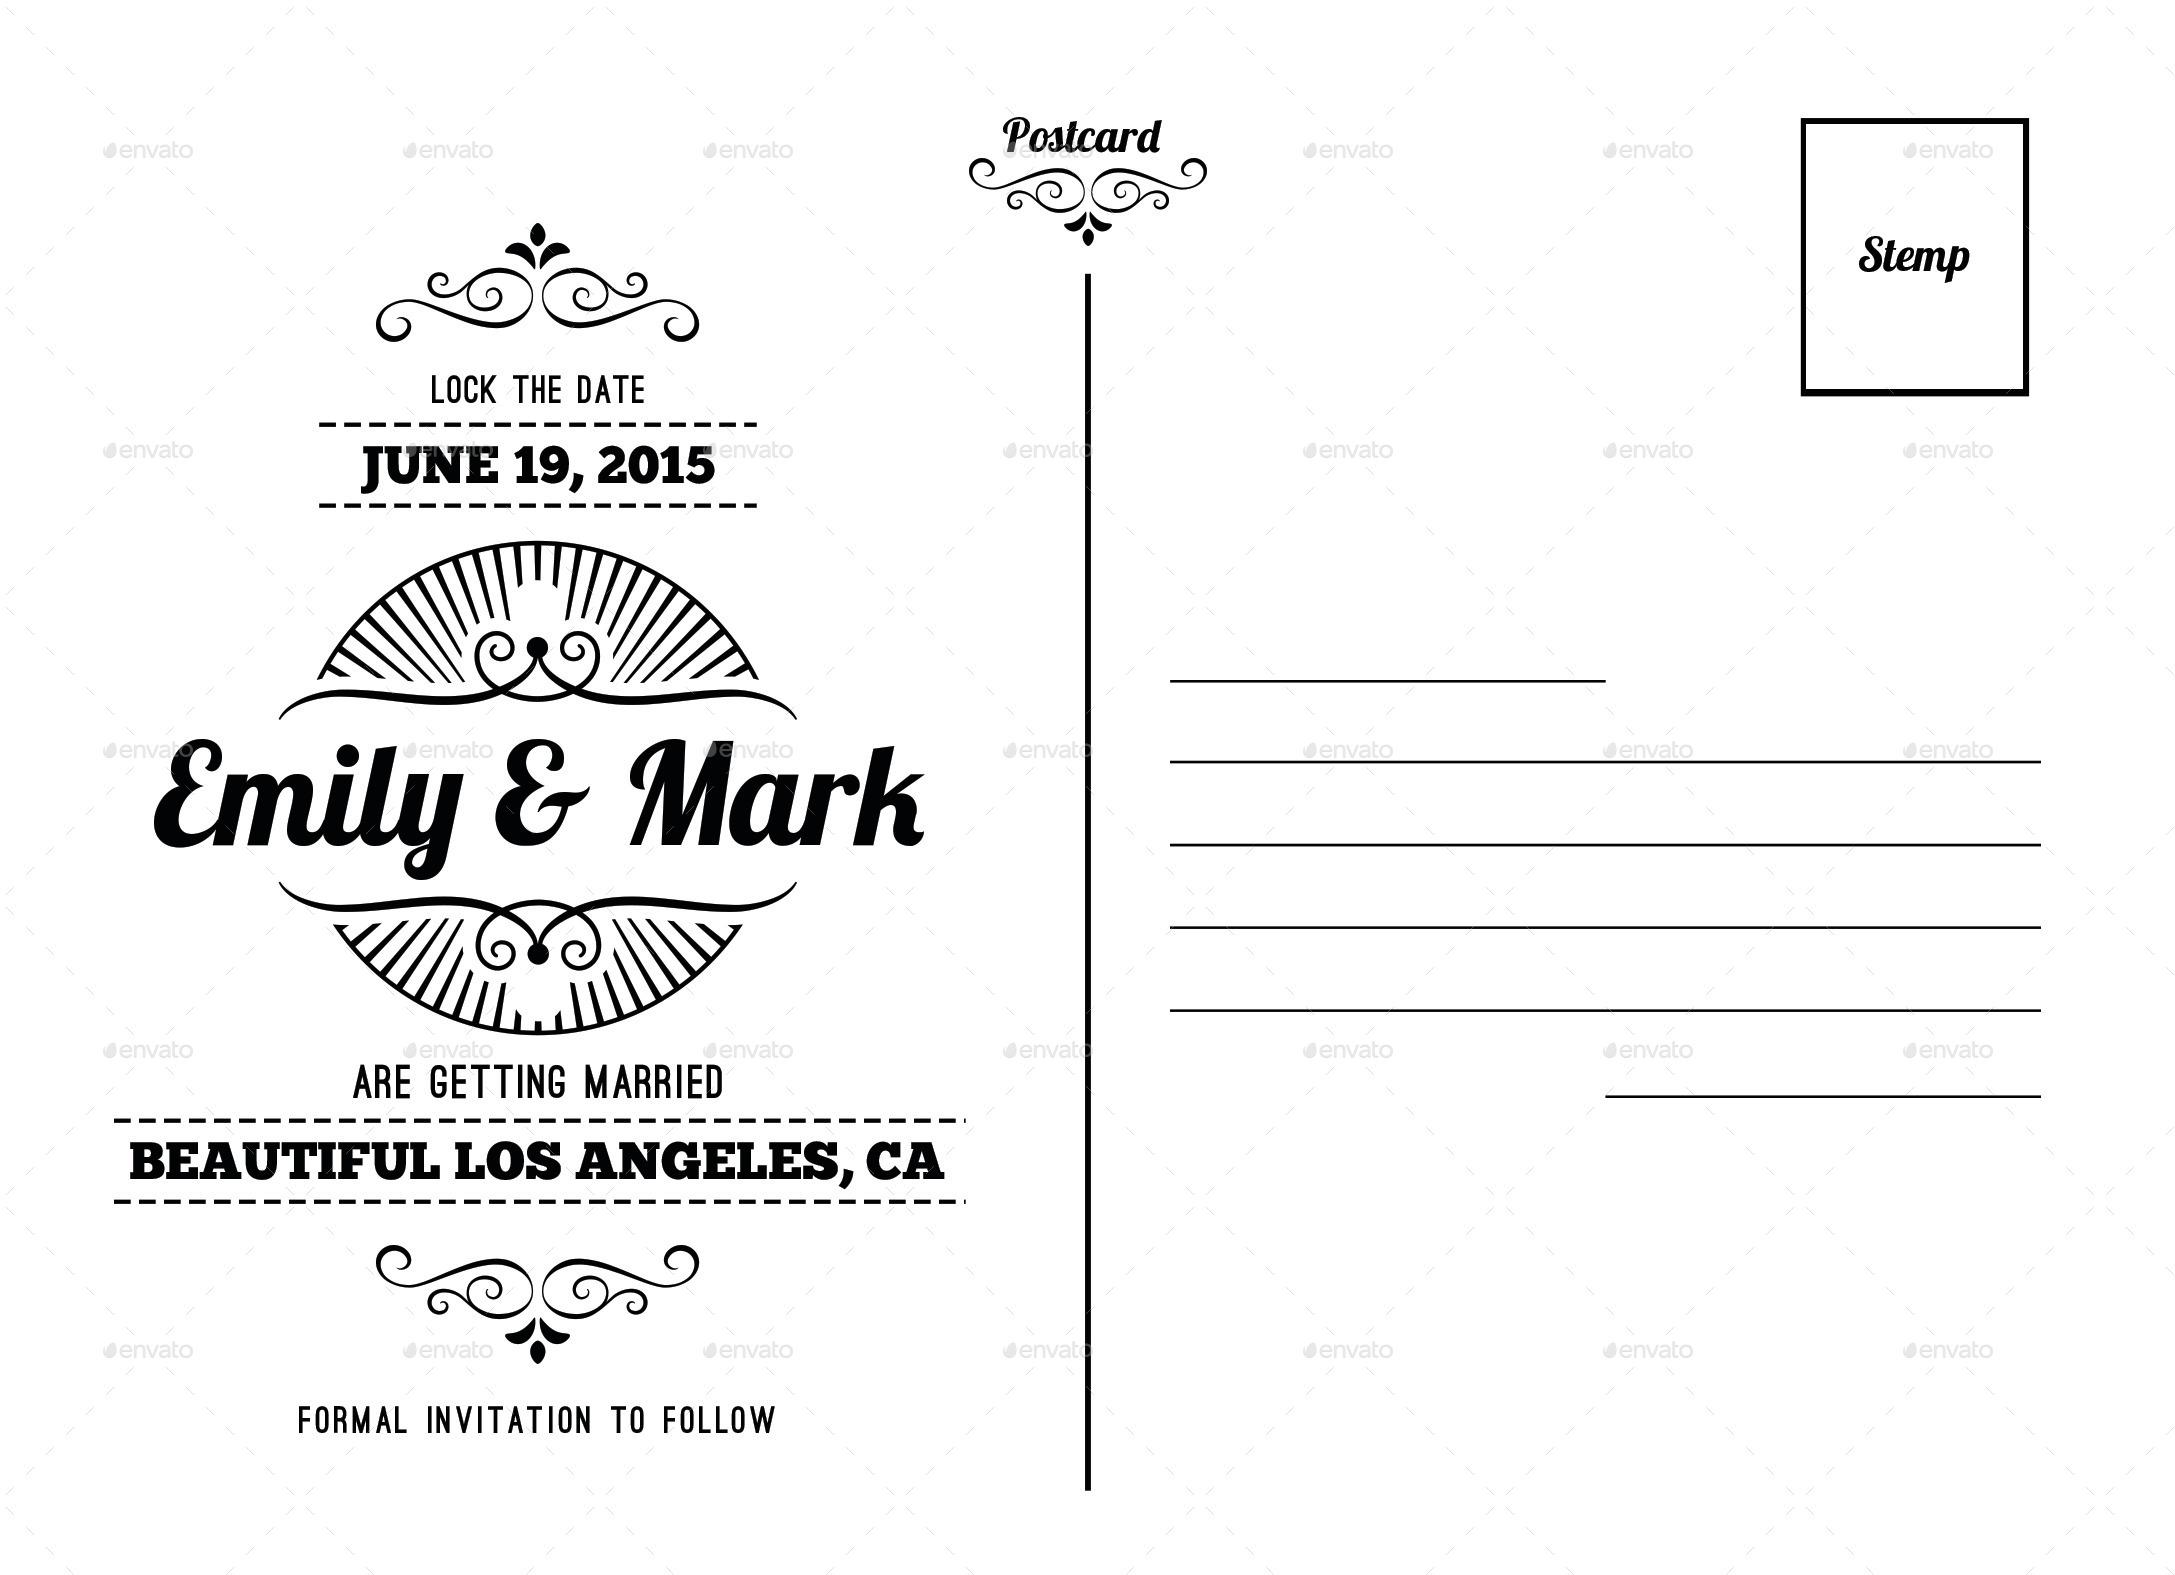 Wedding postcard by nishamehta graphicriver previewlock the date card template balck white backg maxwellsz